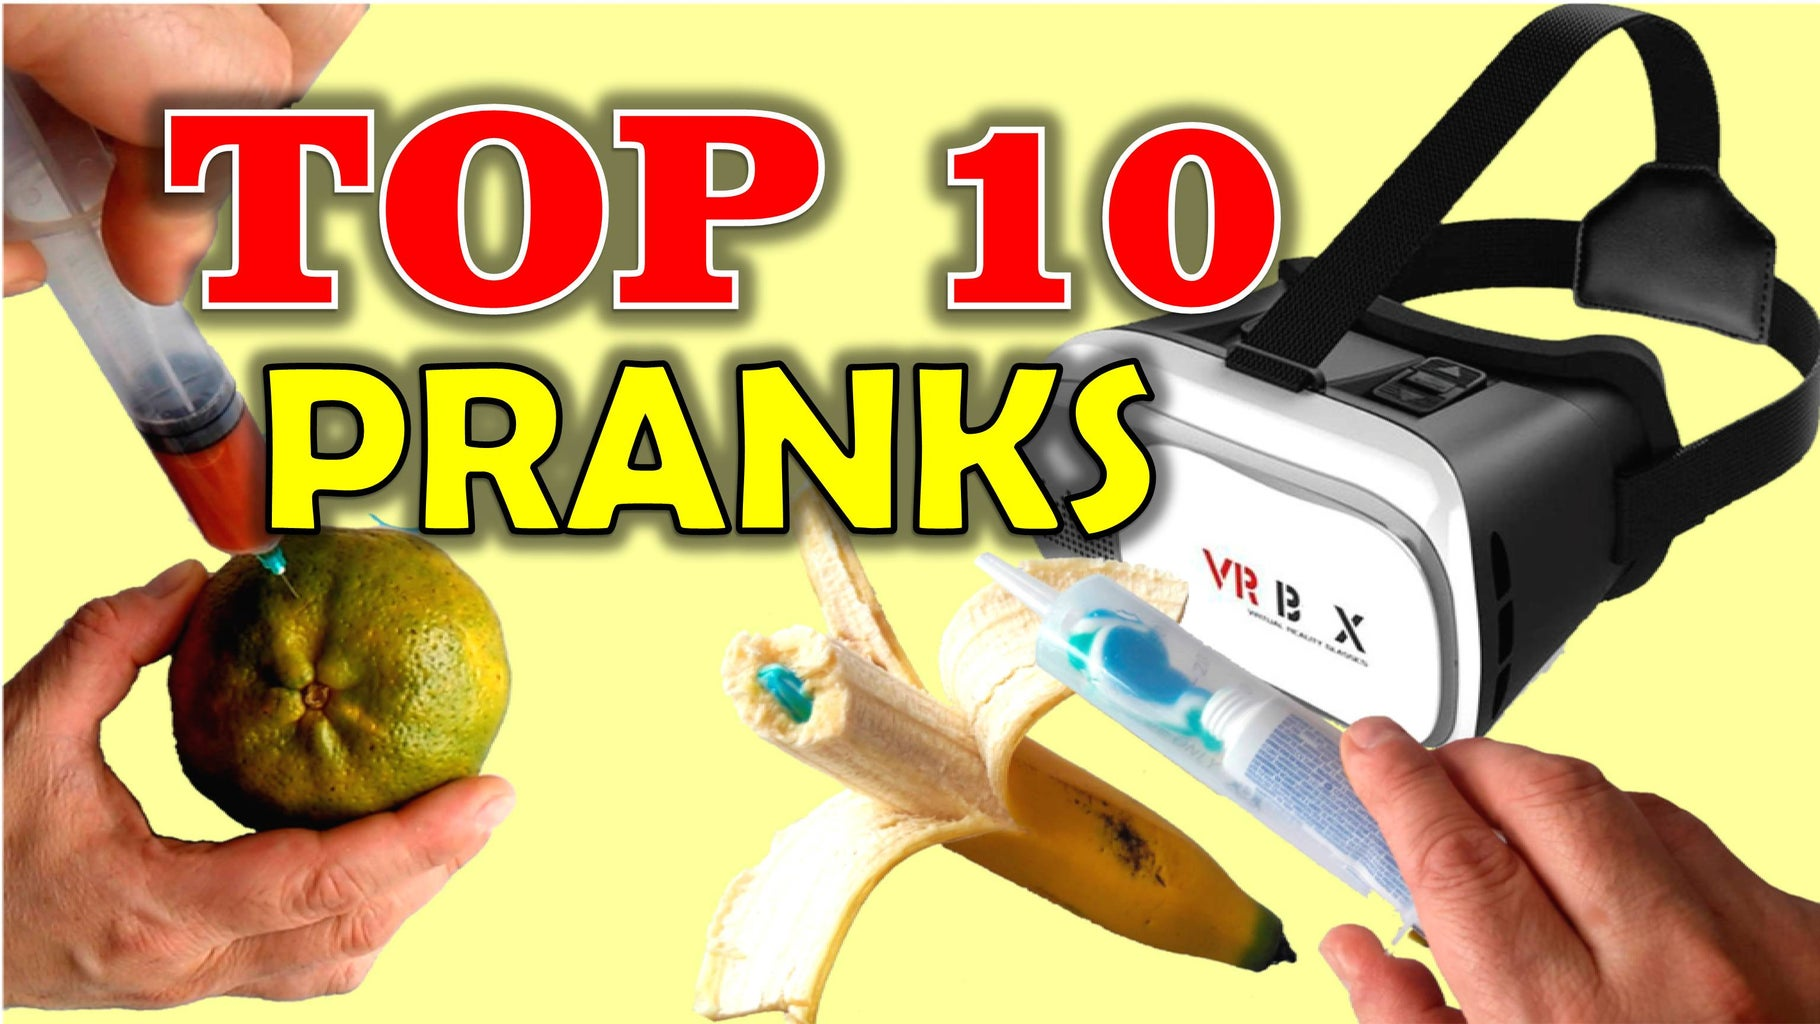 TOP 10 PRANKS - Easy Pranks to Make Your Friends